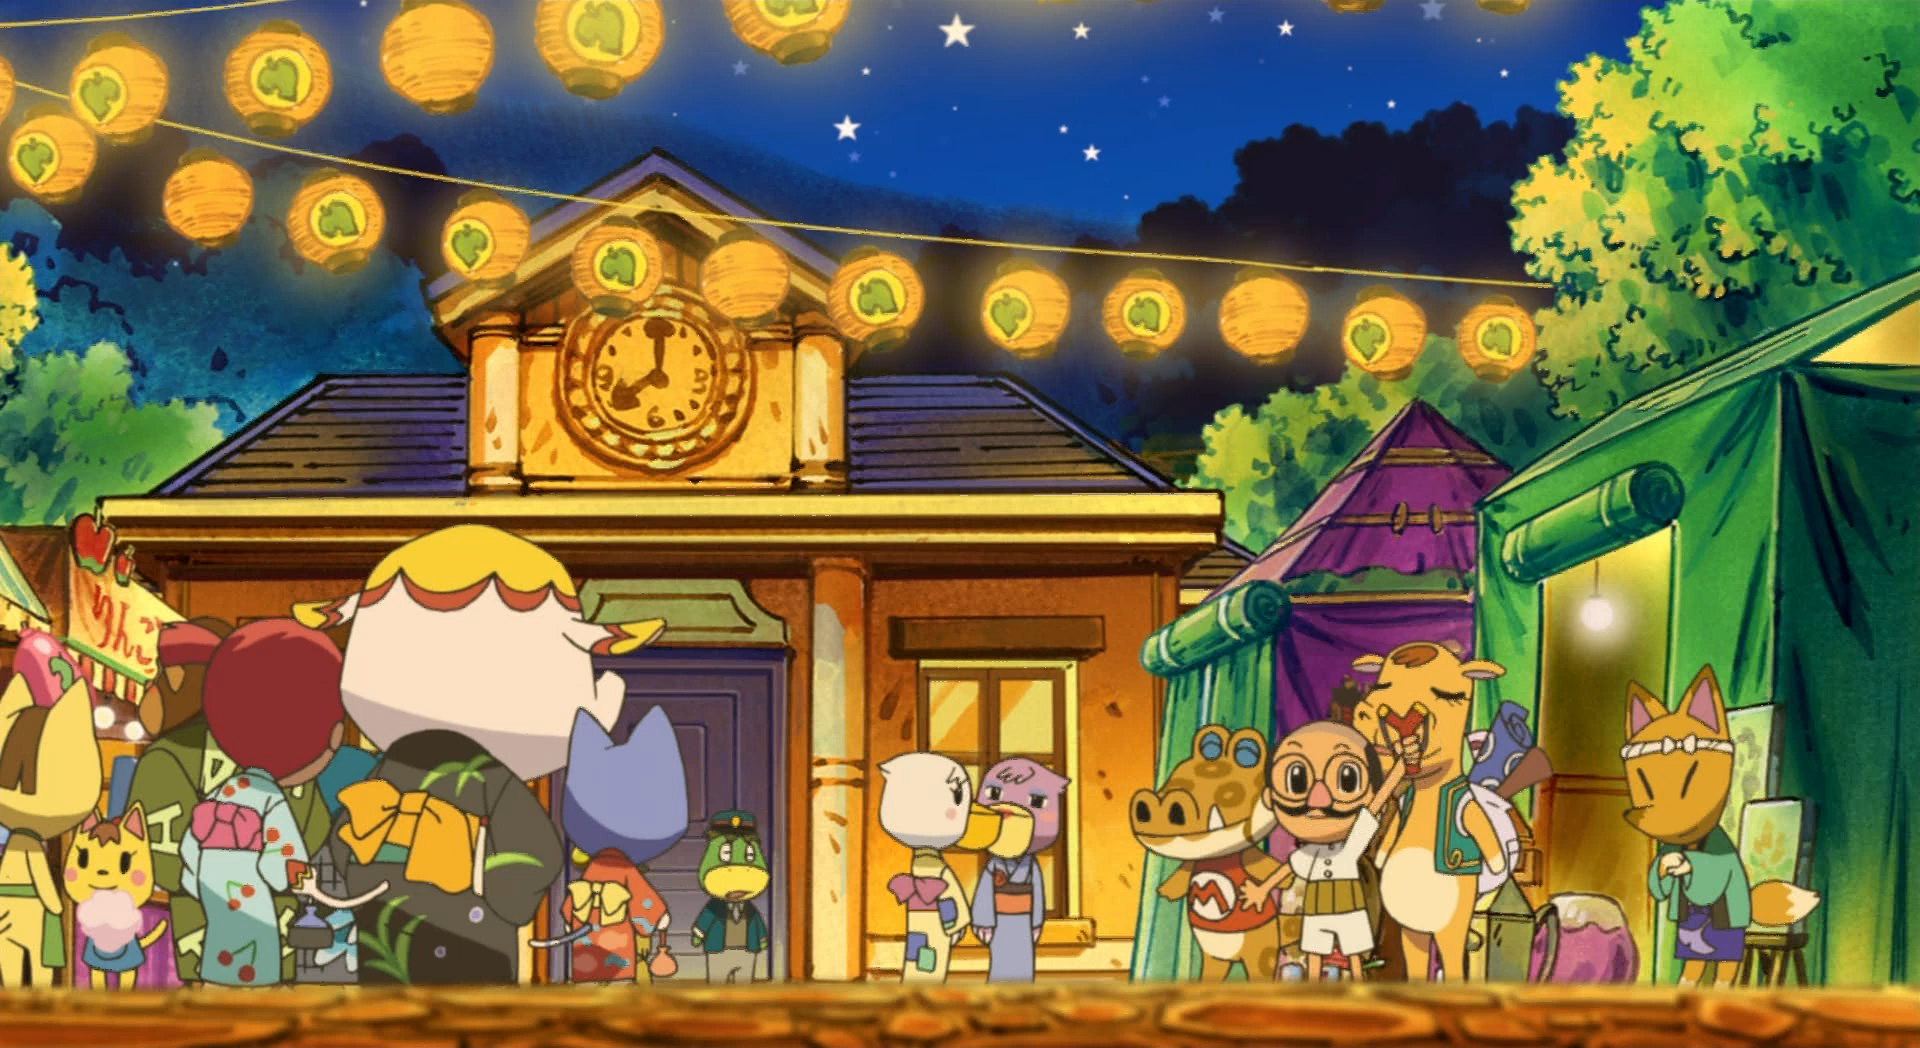 49+ Animal Crossing New Leaf Wallpaper on WallpaperSafari